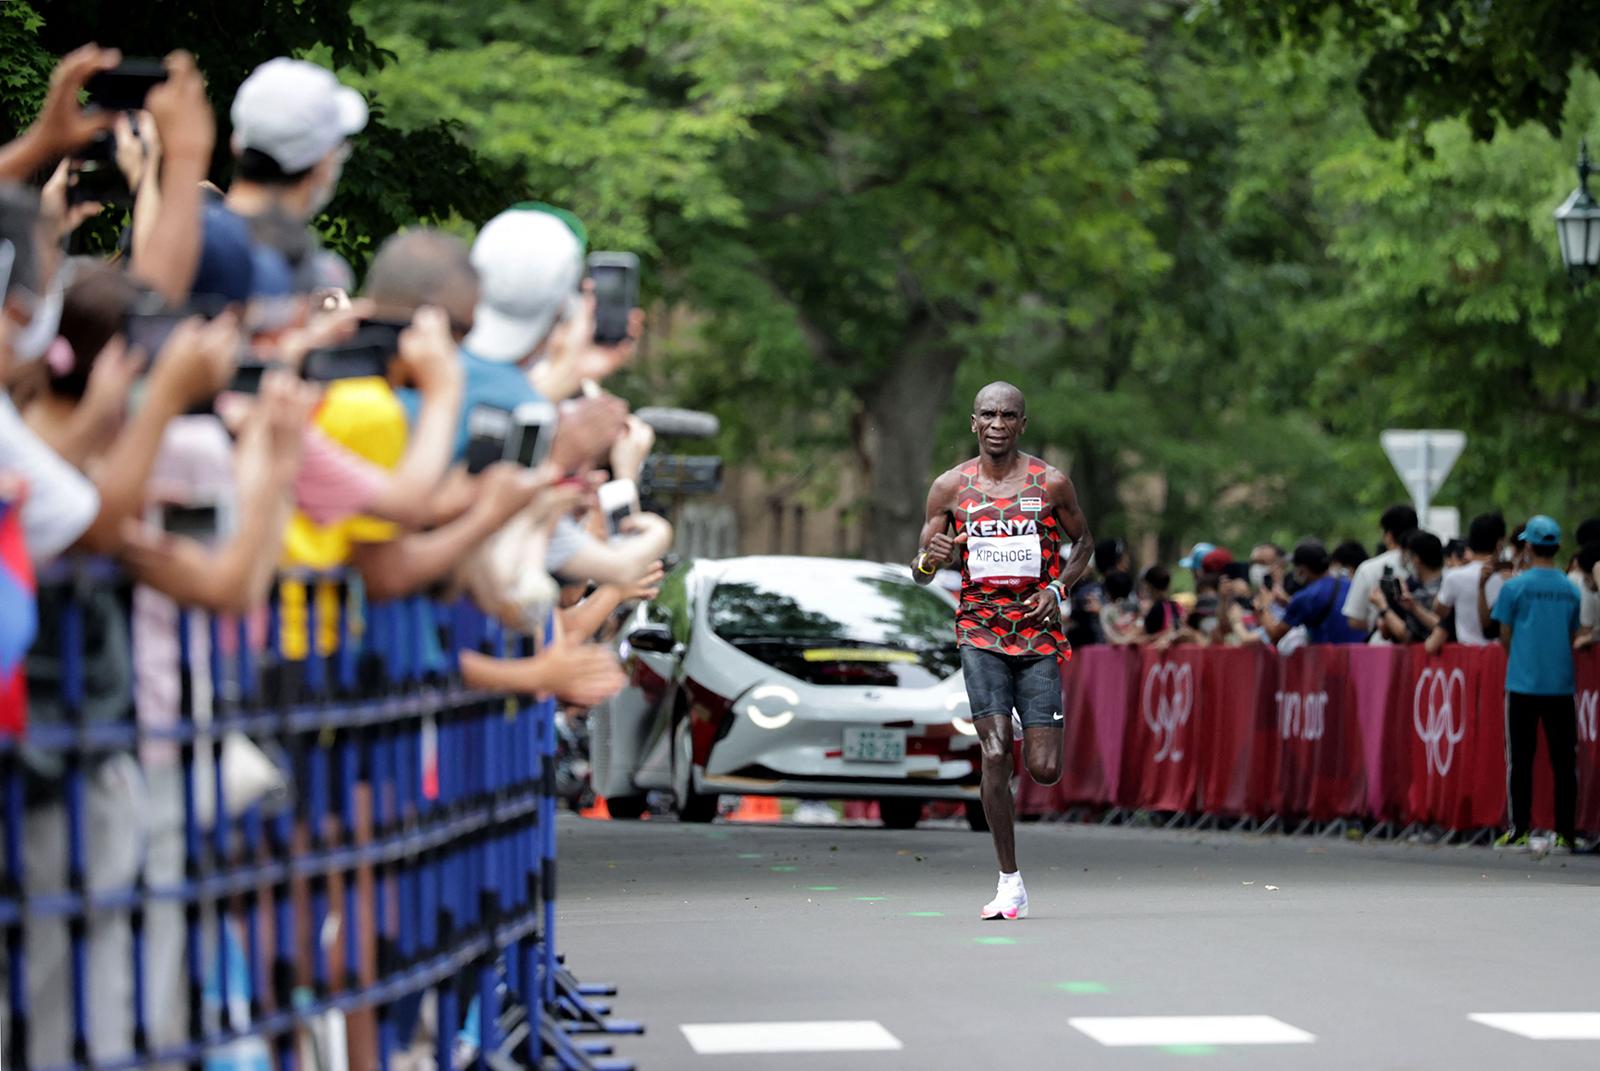 Kenya's Eliud Kipchoge competes in the marathon final on Sunday.